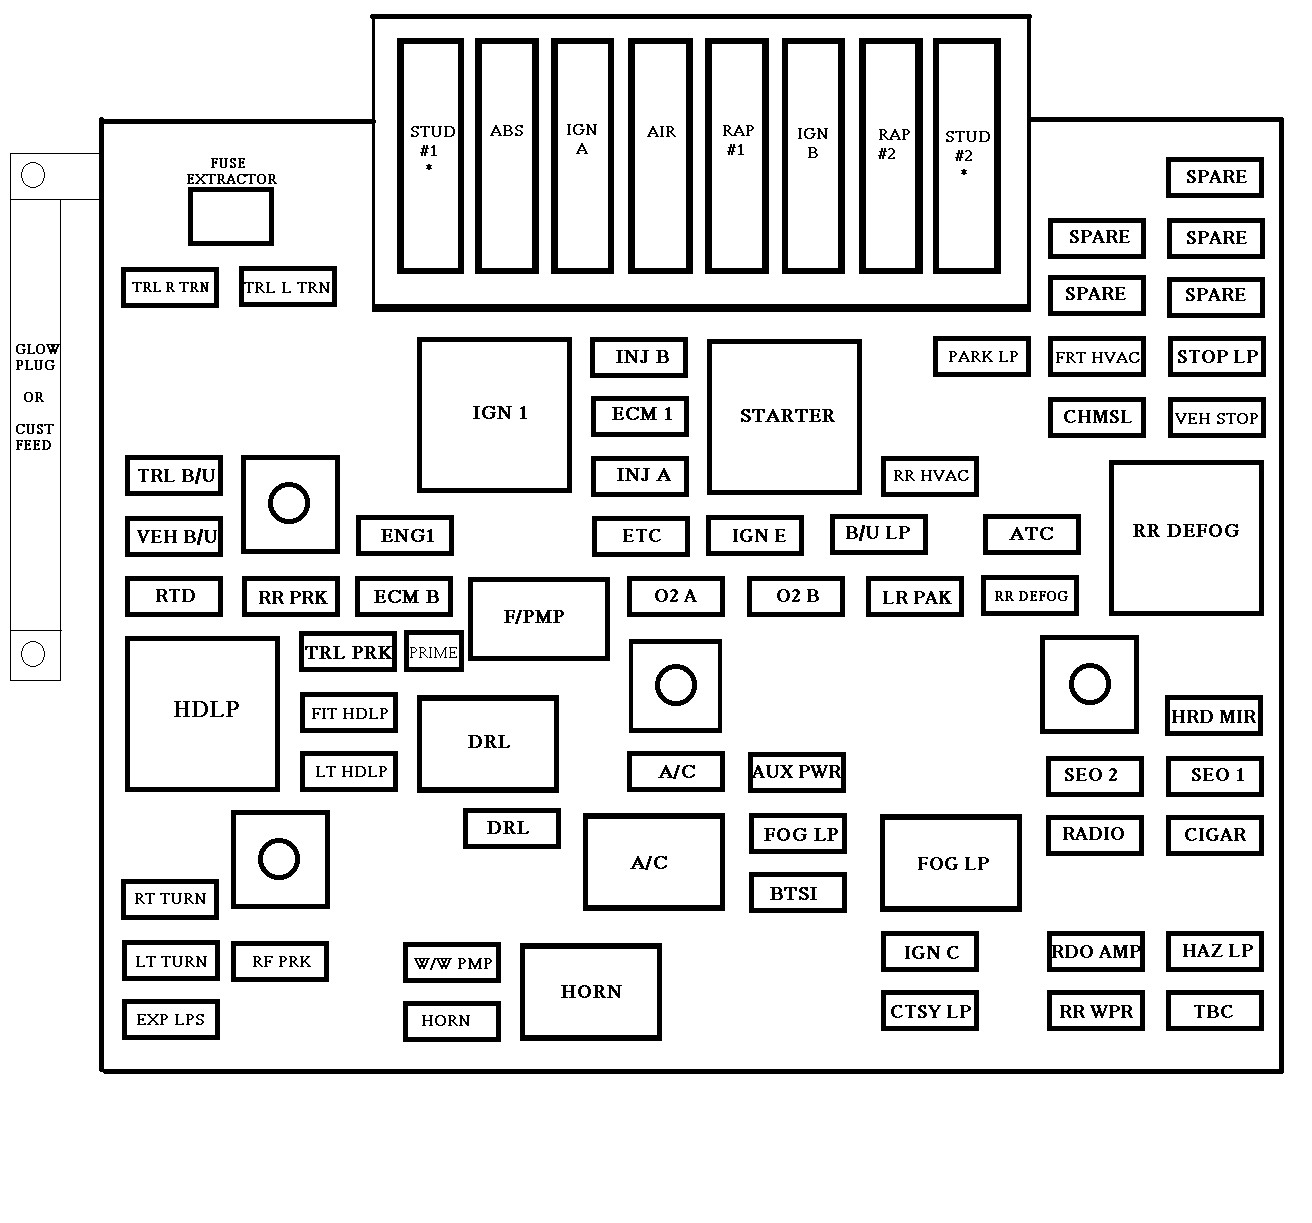 roger vivi ersaks: 2008 Chevy Equinox Wiring Diagram